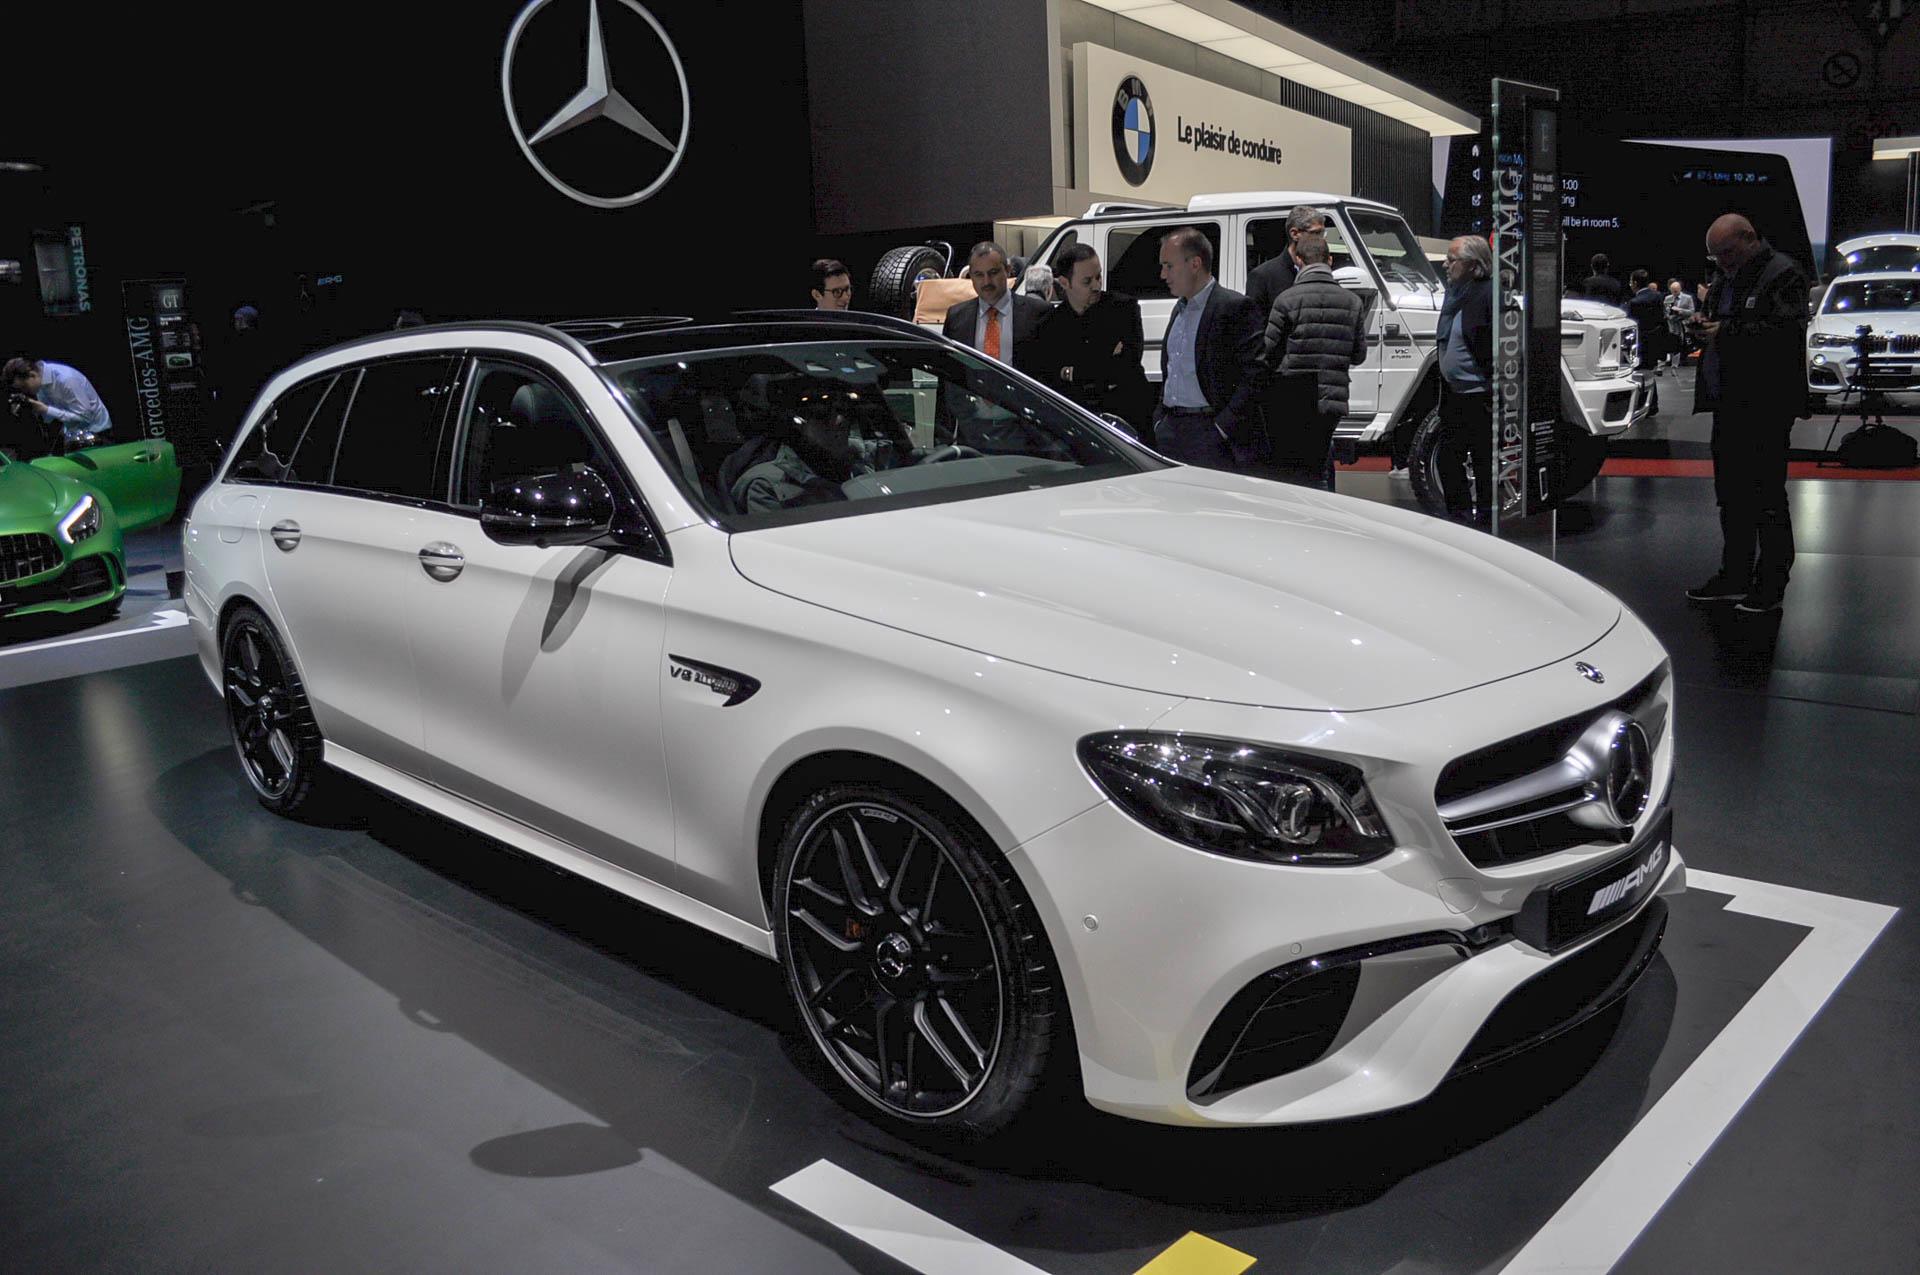 Mercedes amg unveils 603 hp 2018 e63 s wagon for Mercedes benz e63 amg 2018